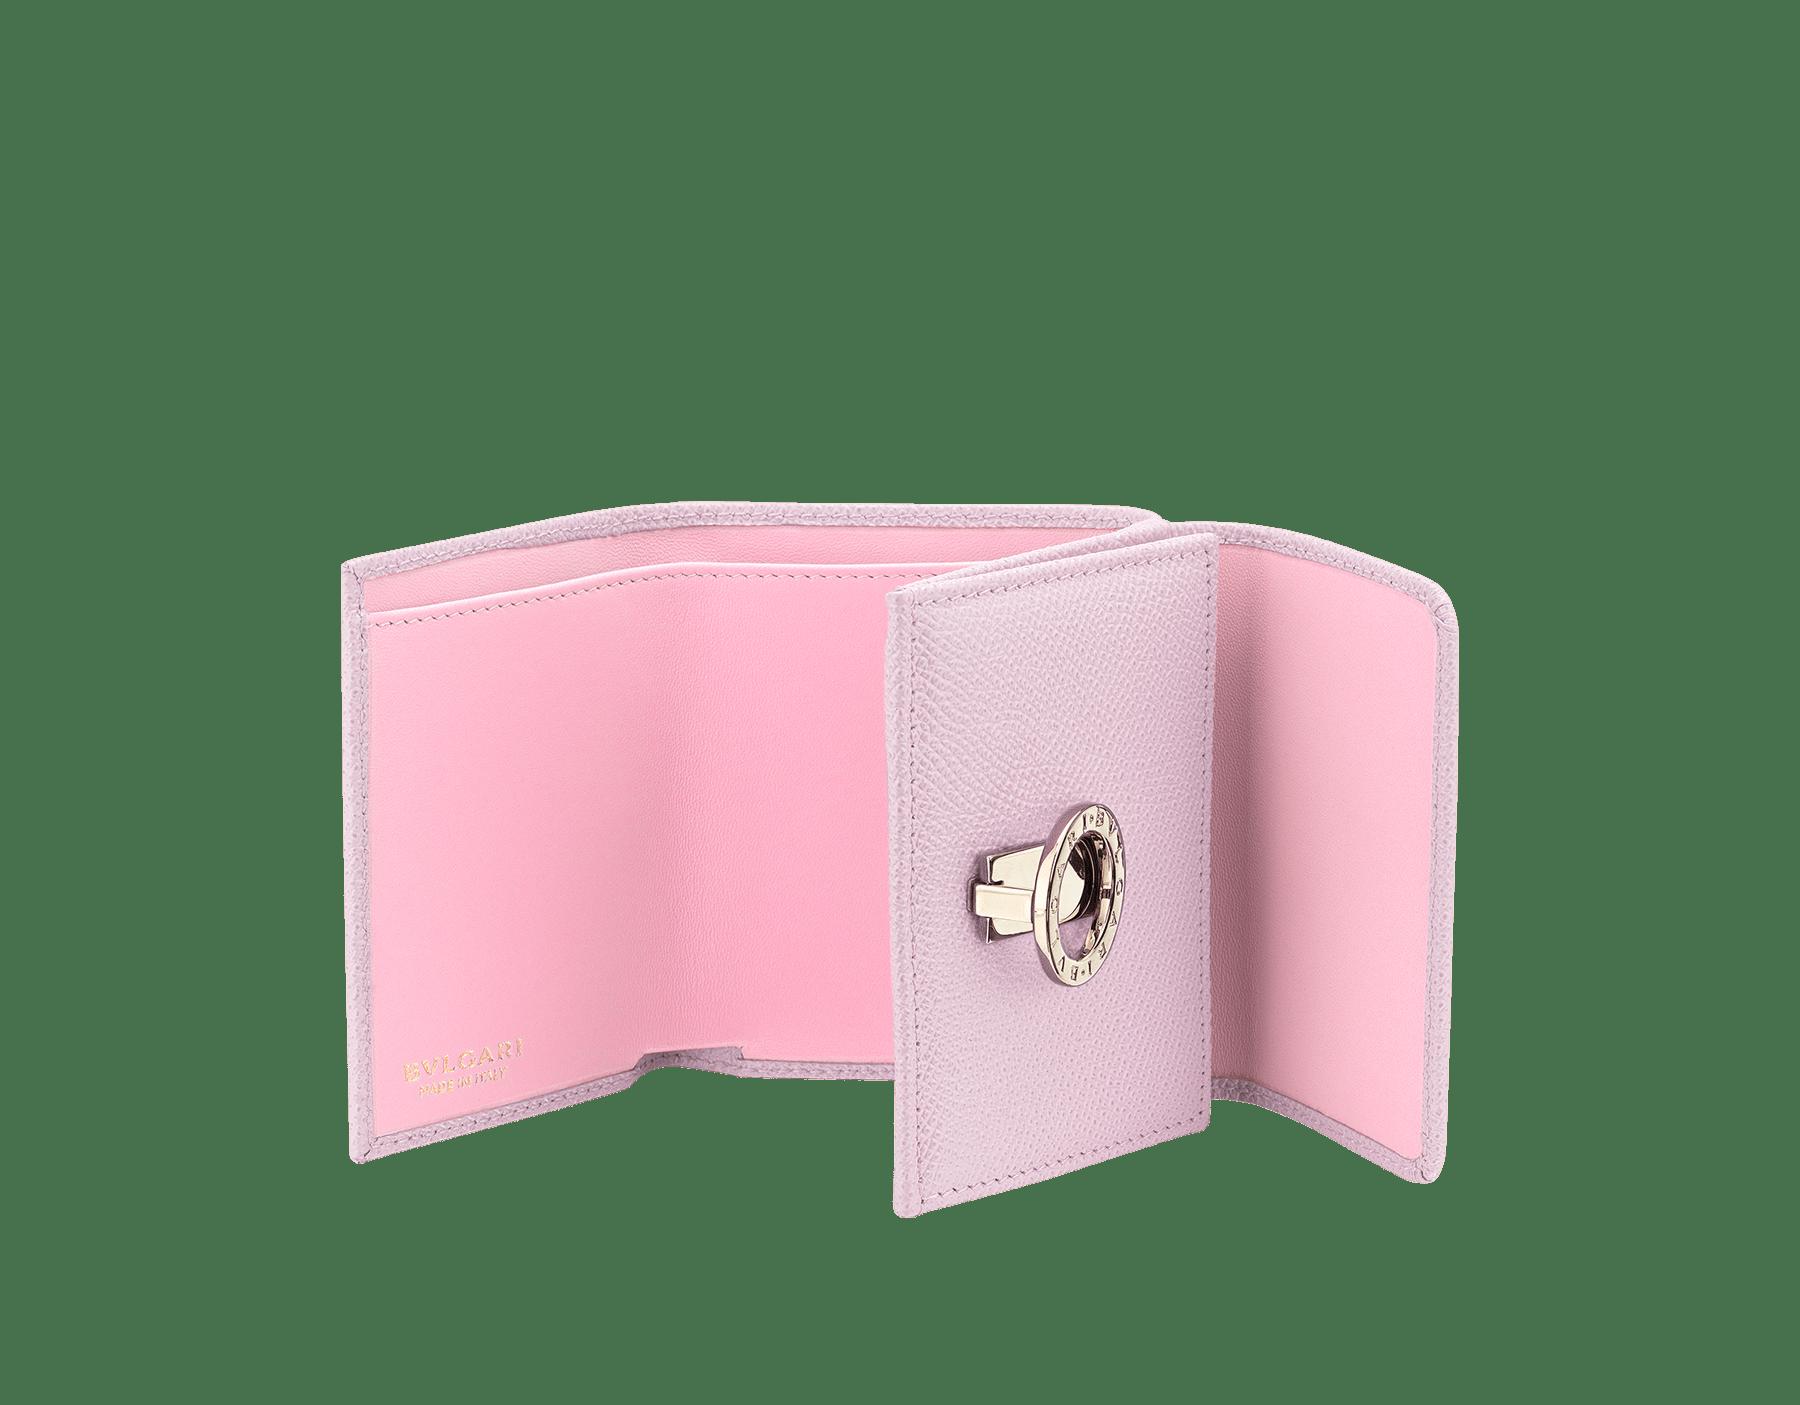 BVLGARI BVLGARI 小巧皮夾,採用雛菊拓帕石色亮珠面小牛皮和水晶玫瑰色 Nappa 軟面皮。掀蓋開合,經典淡金色黃銅品牌標誌扣環和按扣。 579-MINICOMPACTa image 2